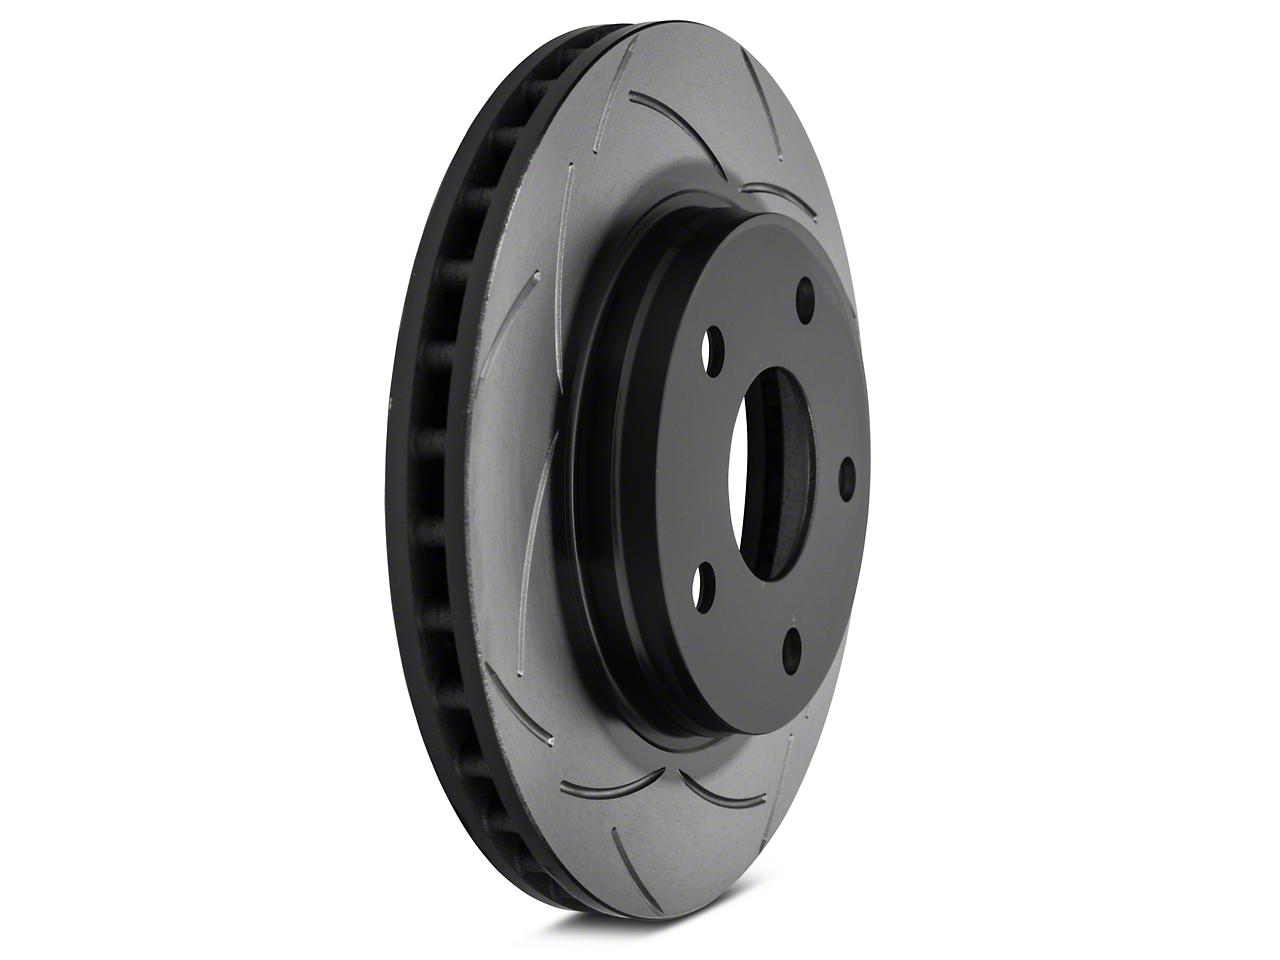 DBA T2 Street Series Slotted Rotor - Front Pair (07-12 Wrangler JK)